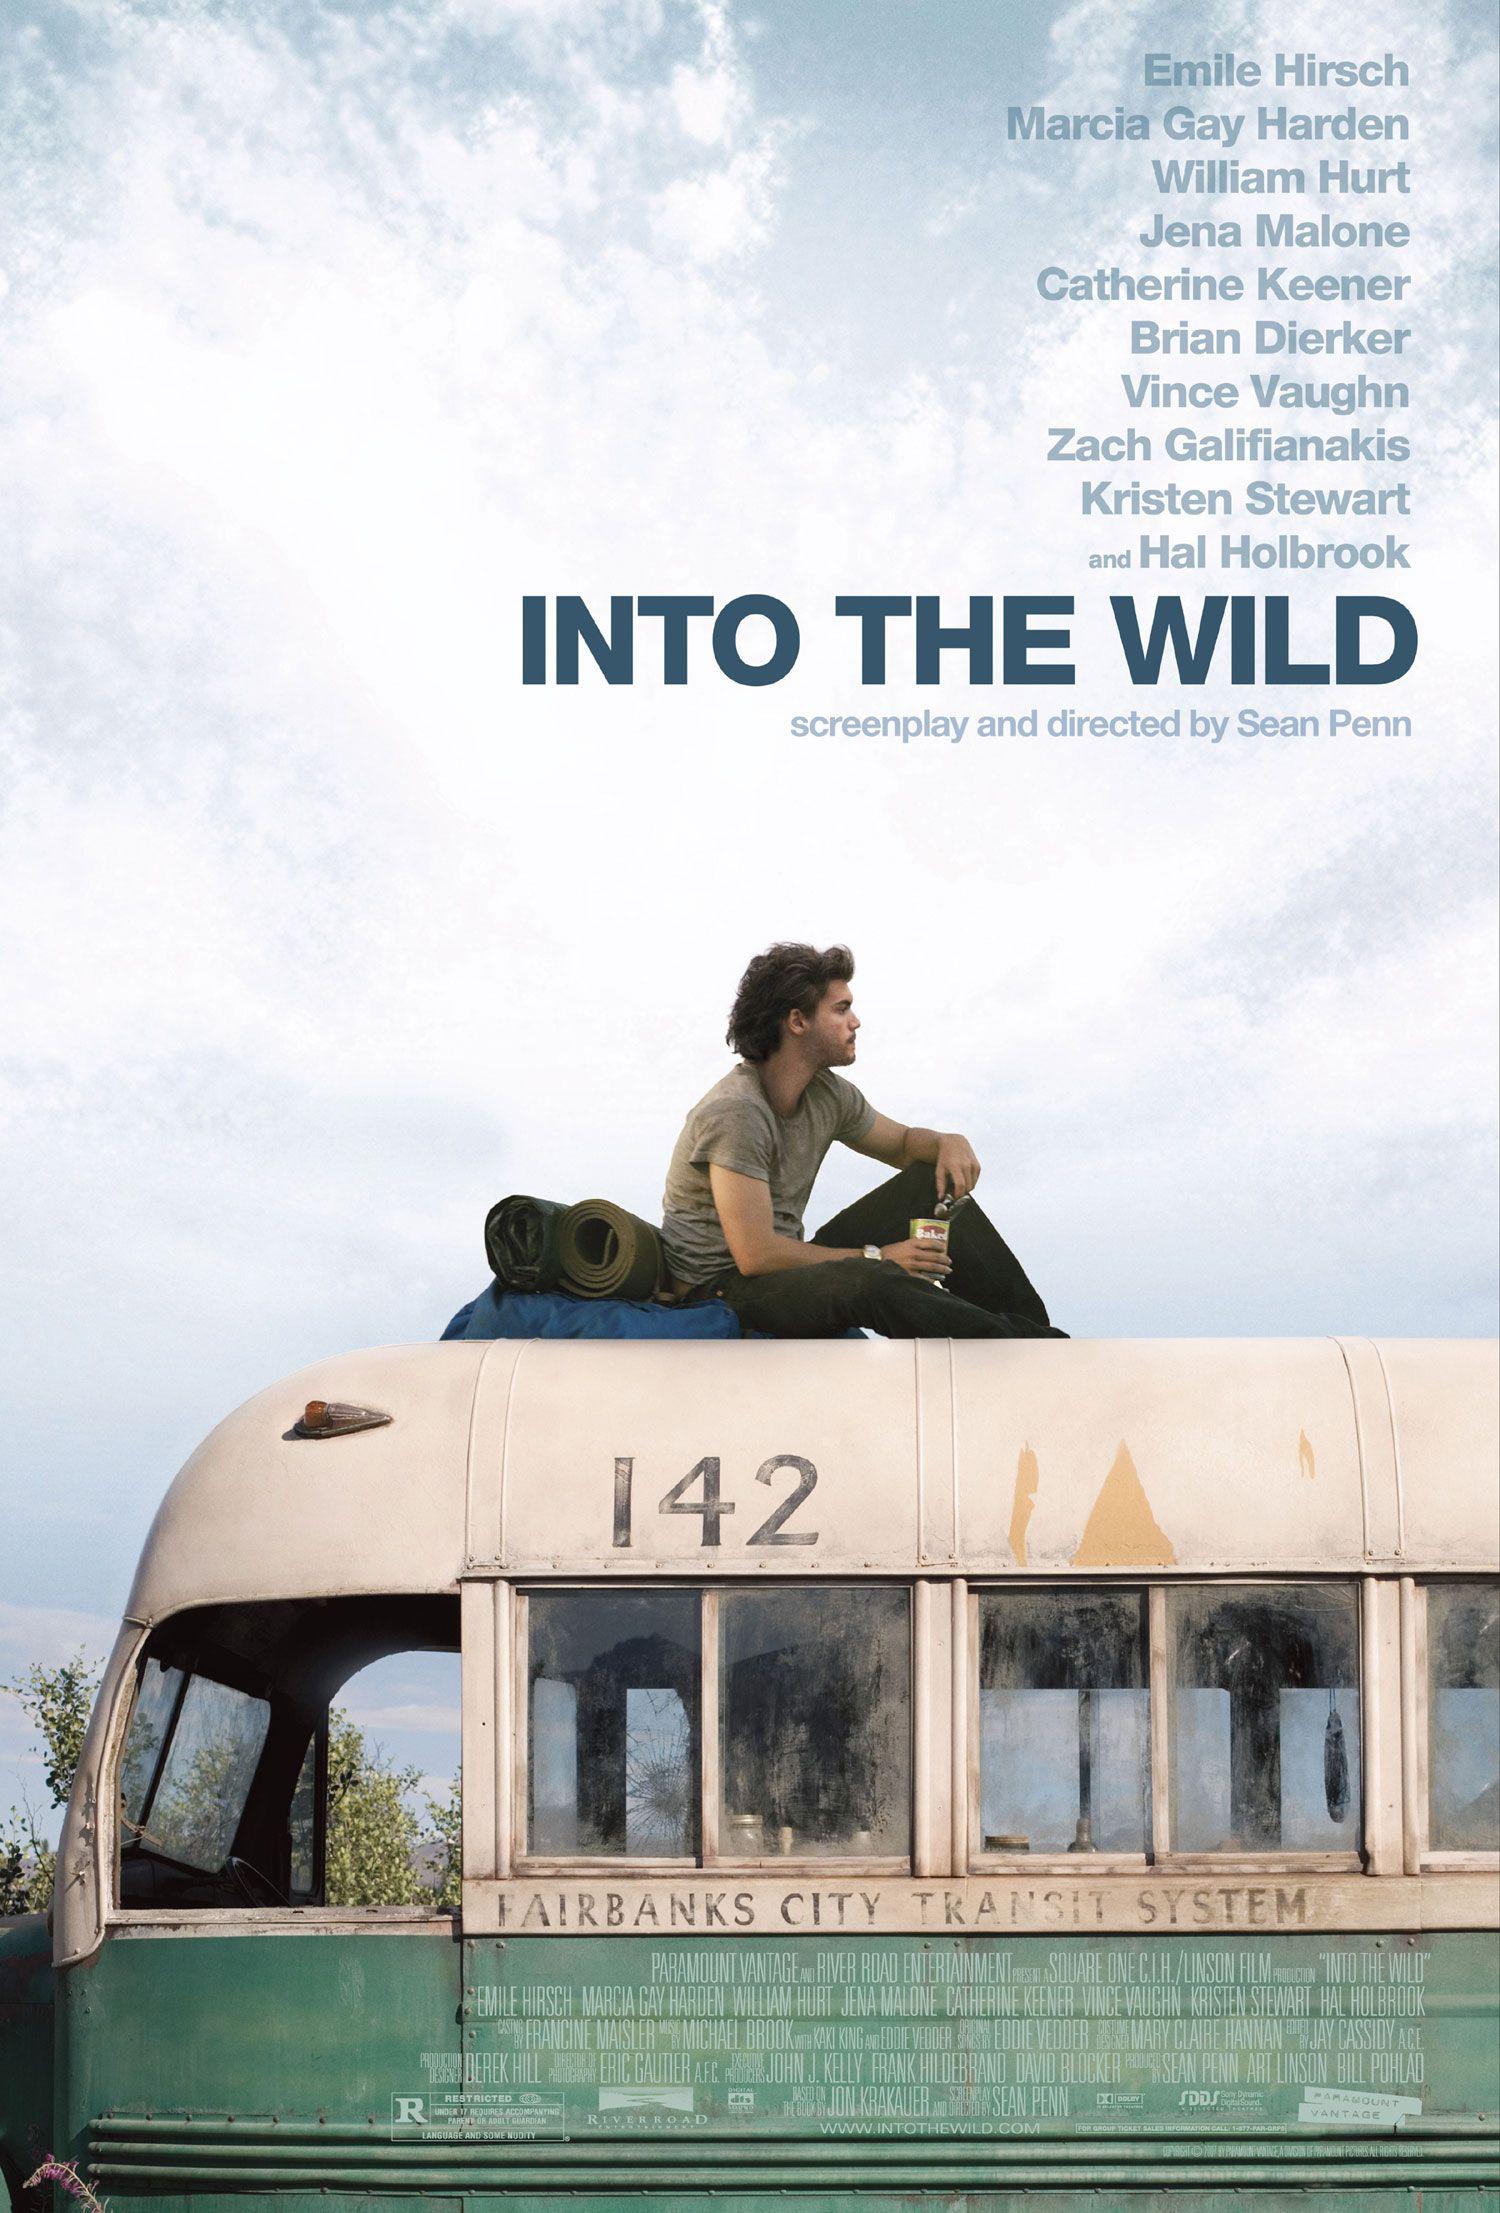 — Into The Wild. Sean Penn